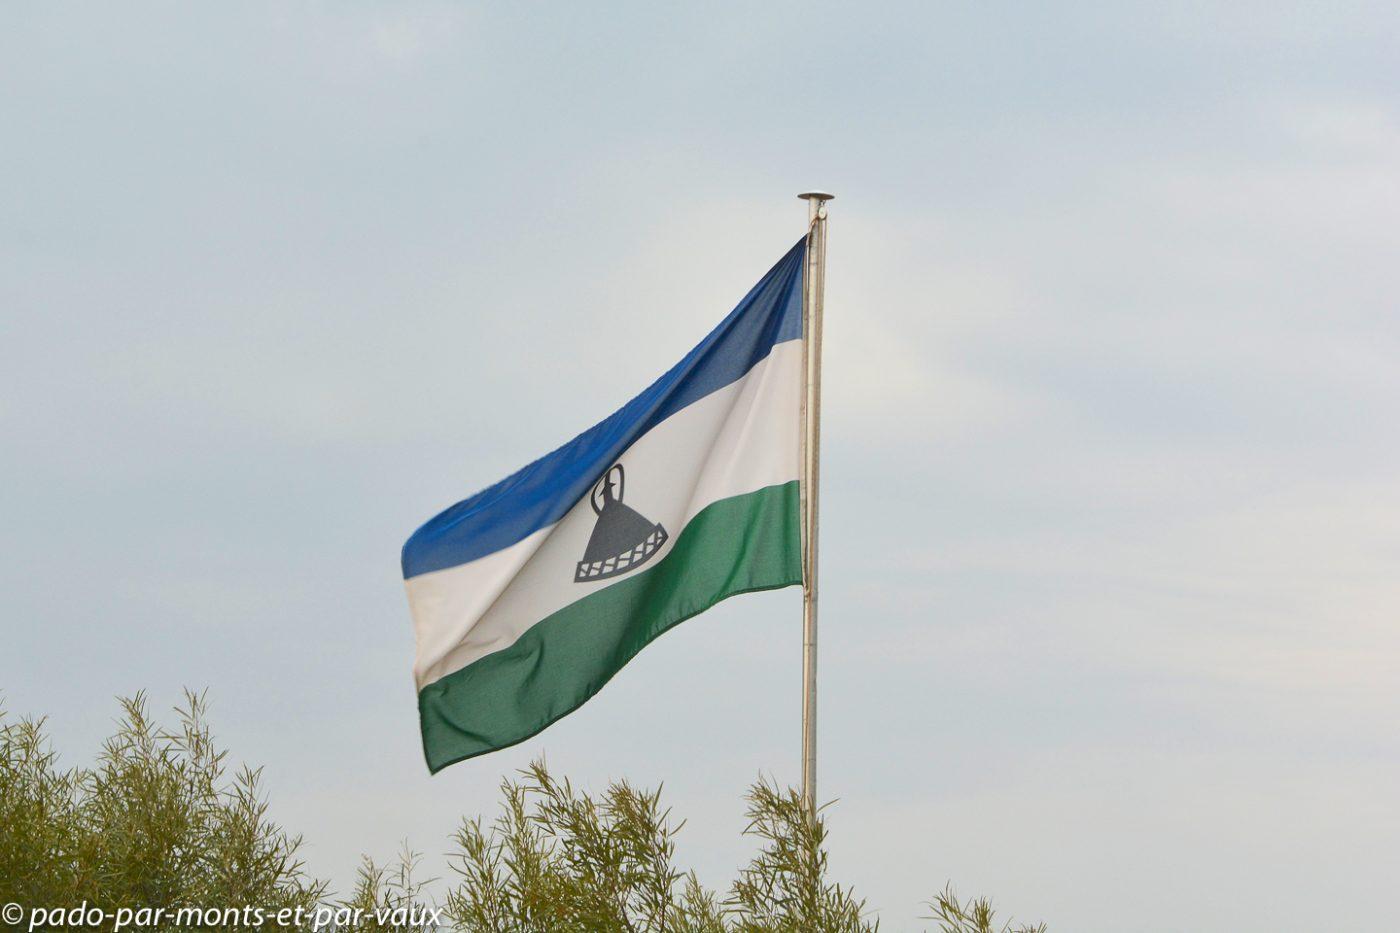 Lesotho - Malealea - drapeau national